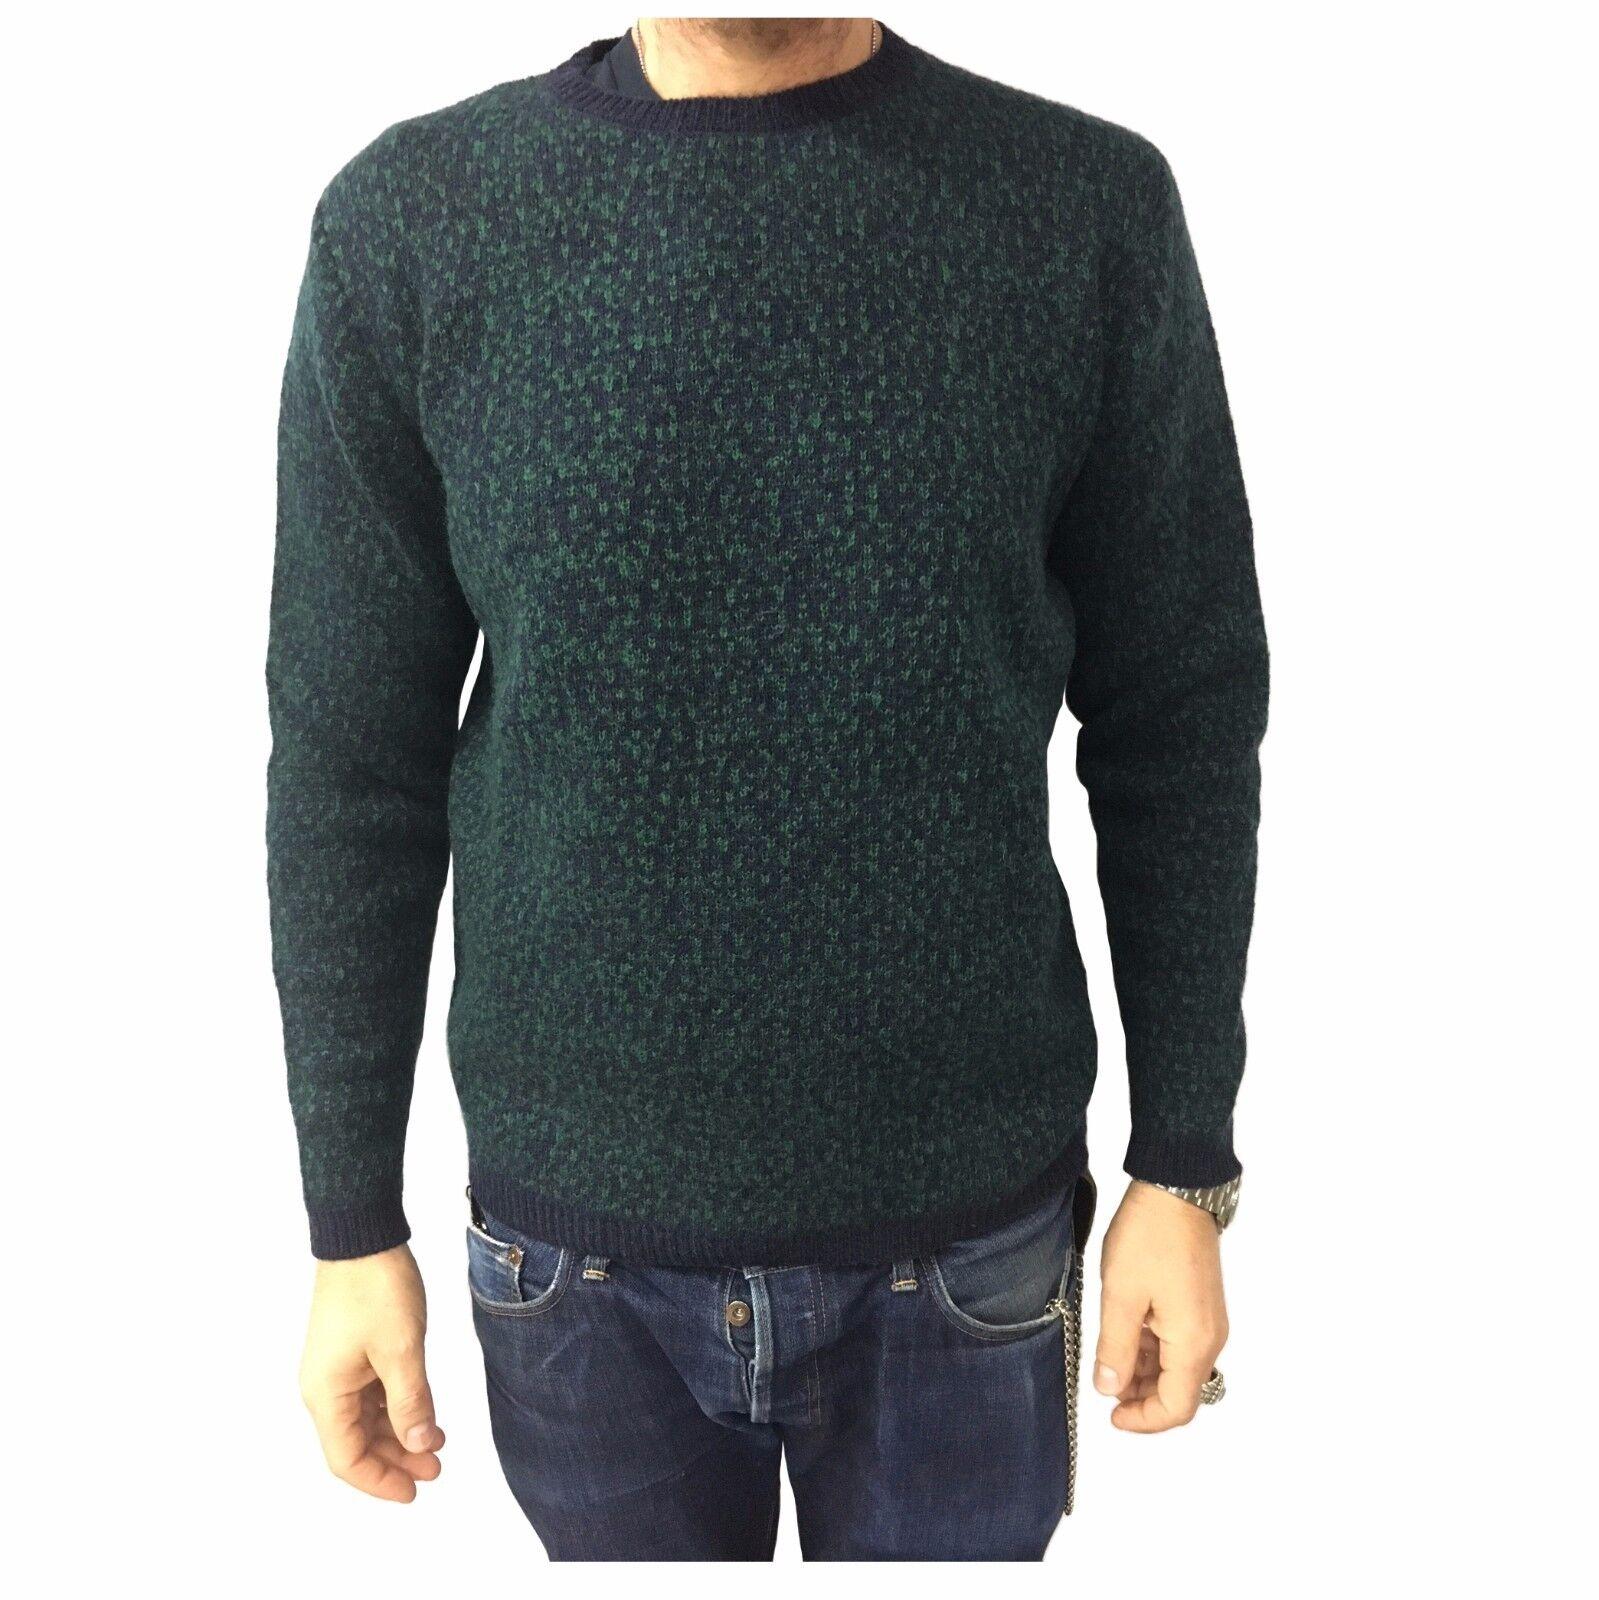 IRISH CRONE men's sweater bluee green 75% wool 7% mohair MADE IN ITALY